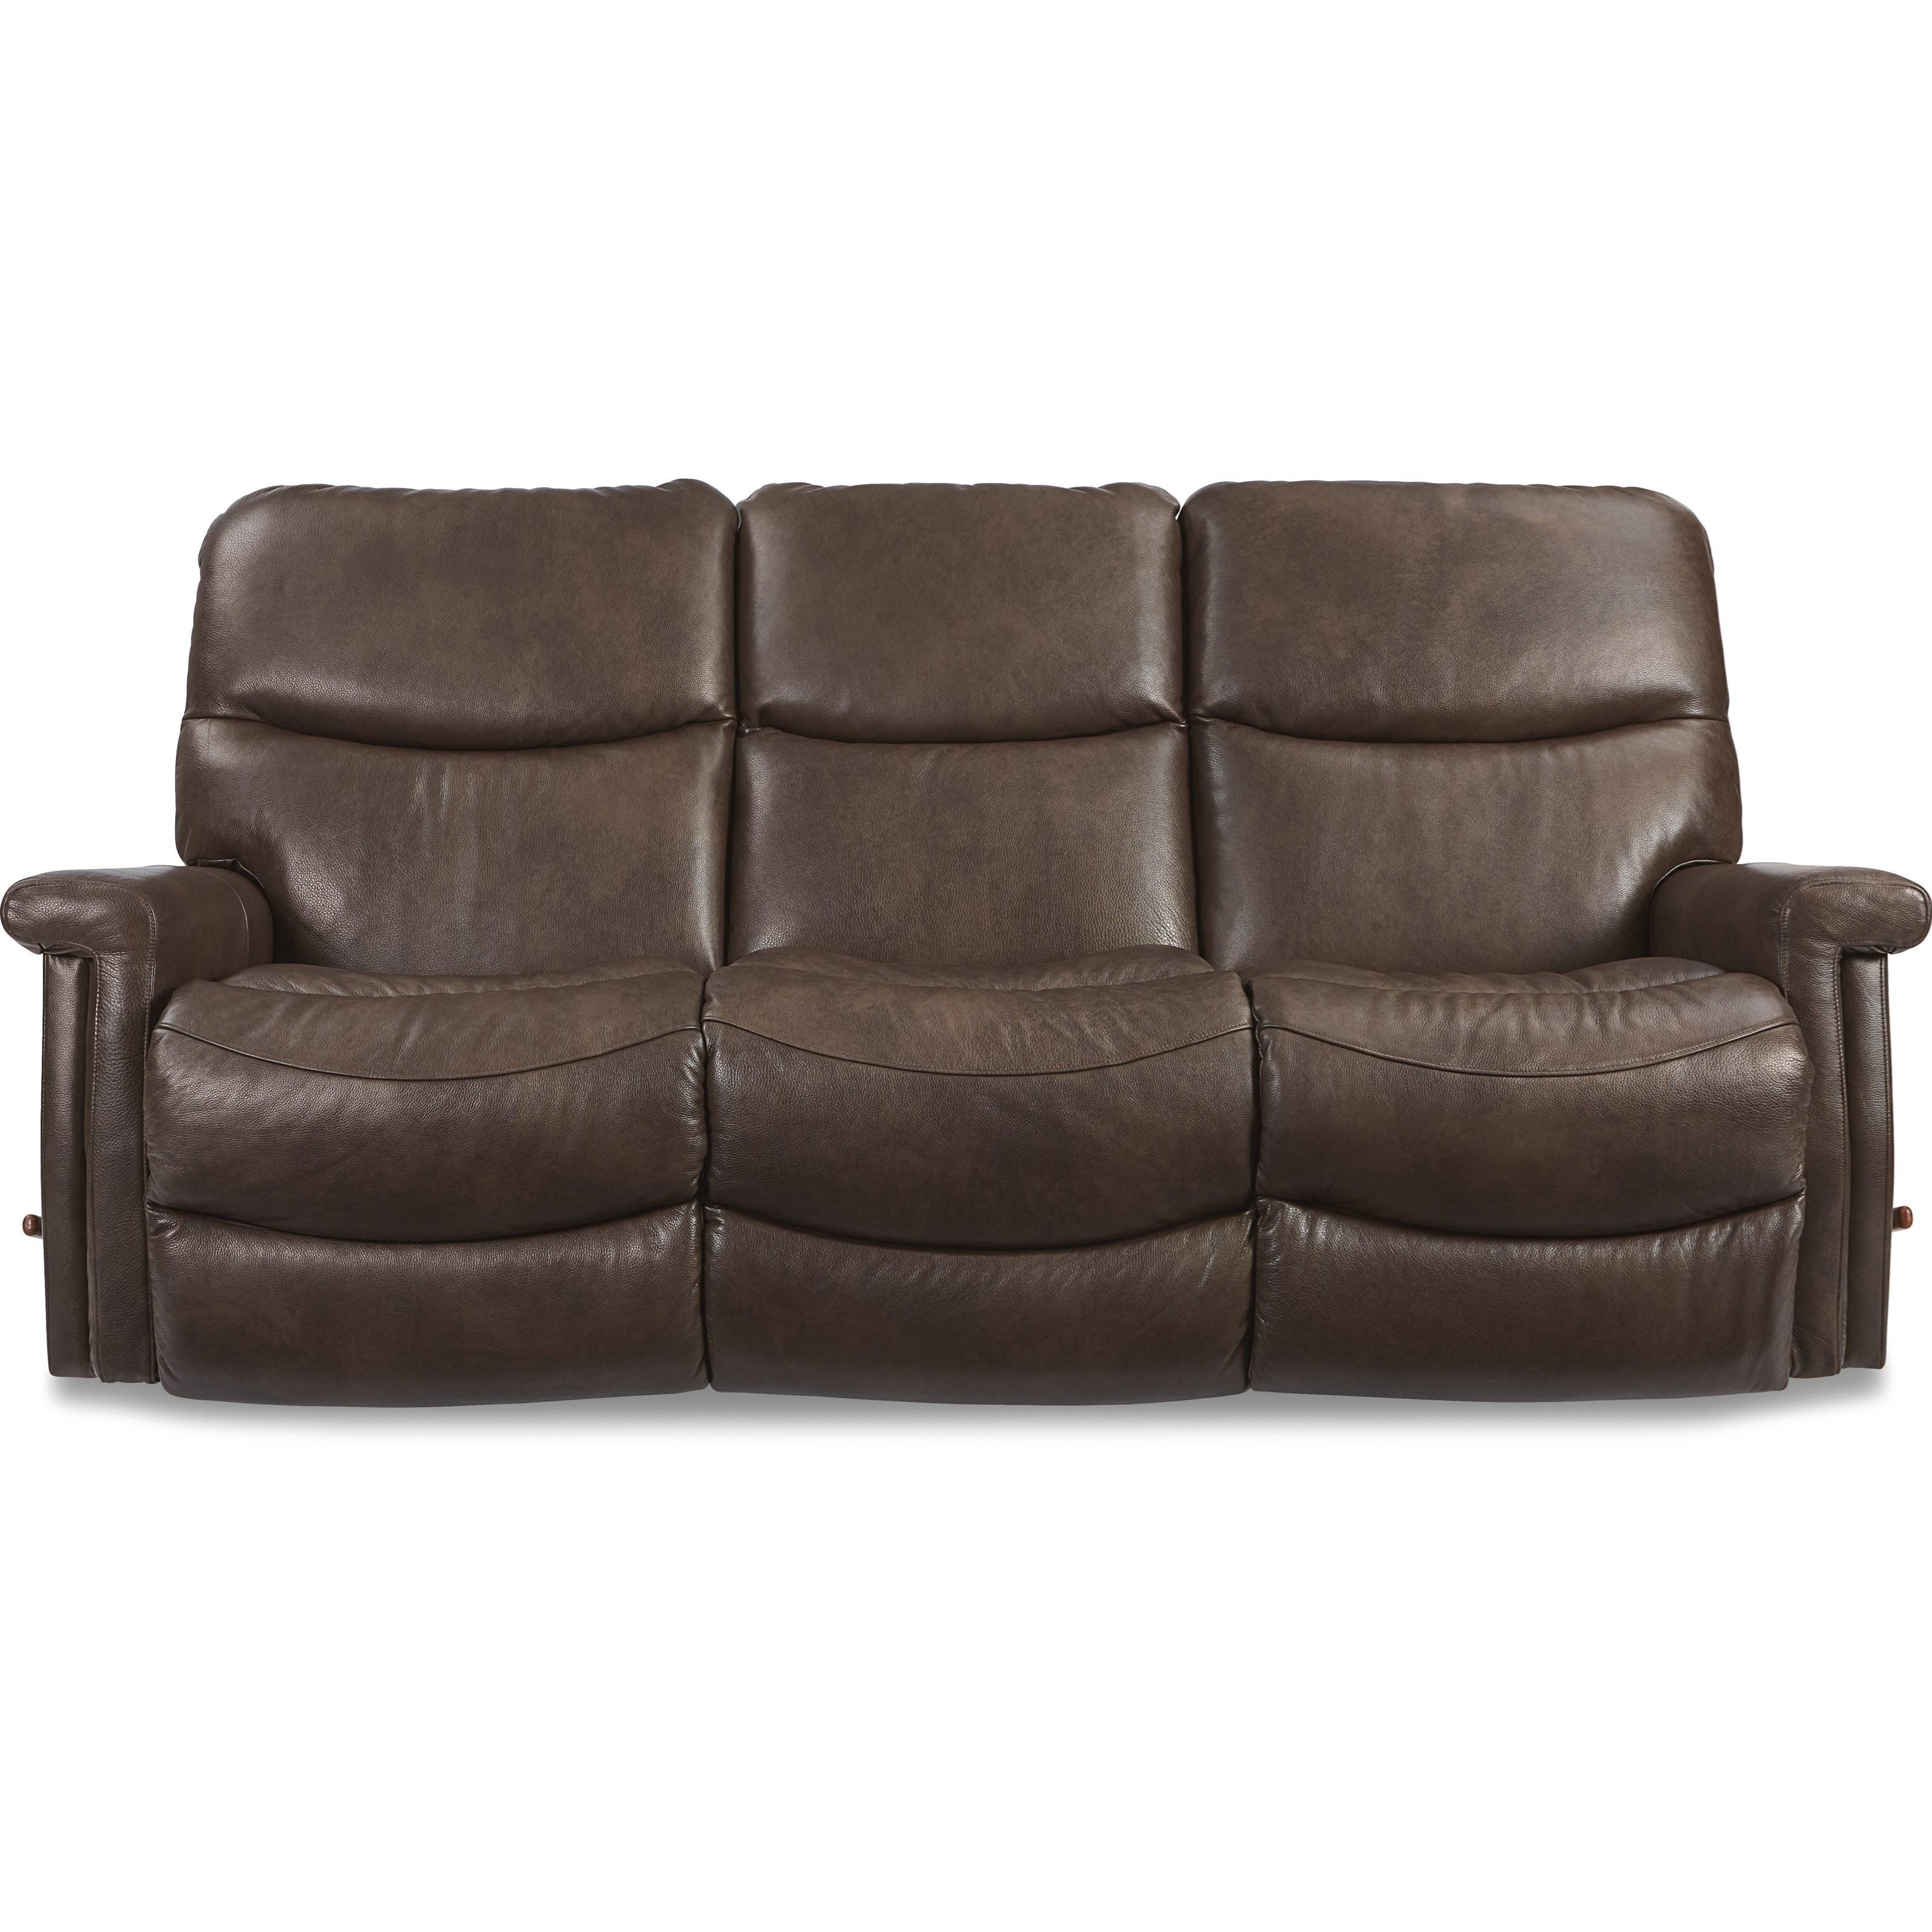 Incroyable Casual Wall Saver Reclining Sofa